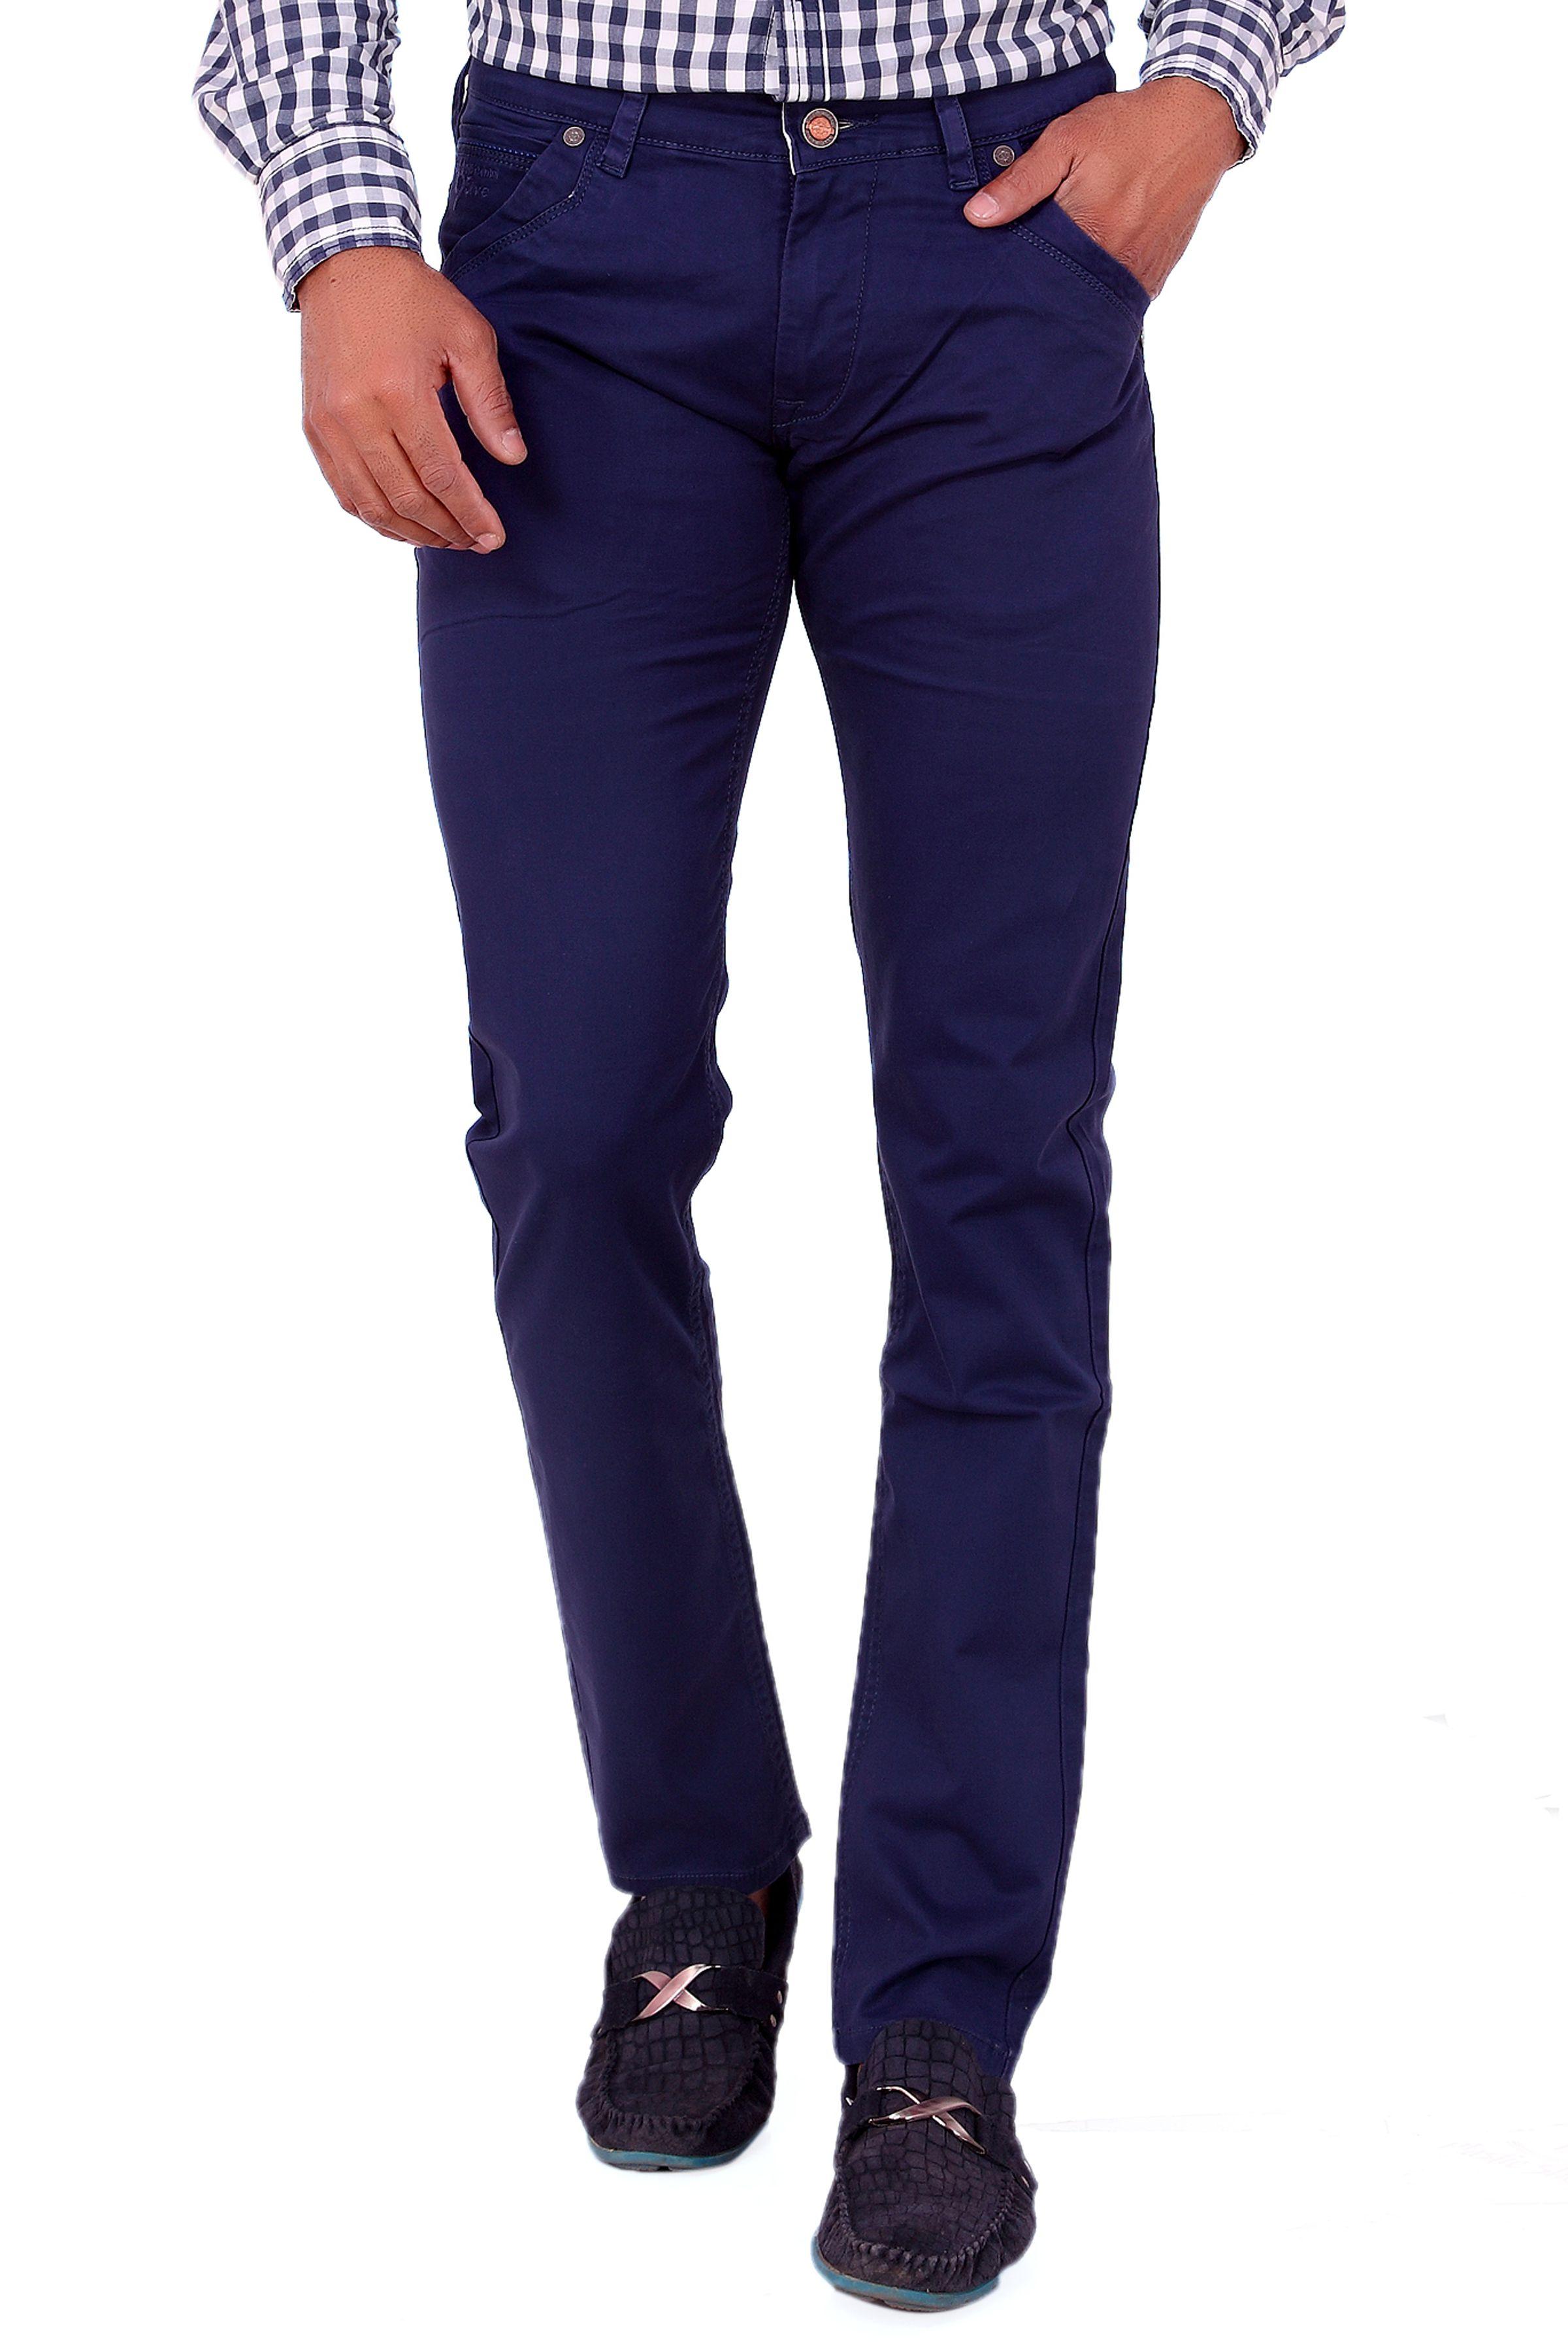 Dare Blue Slim -Fit Flat Trousers